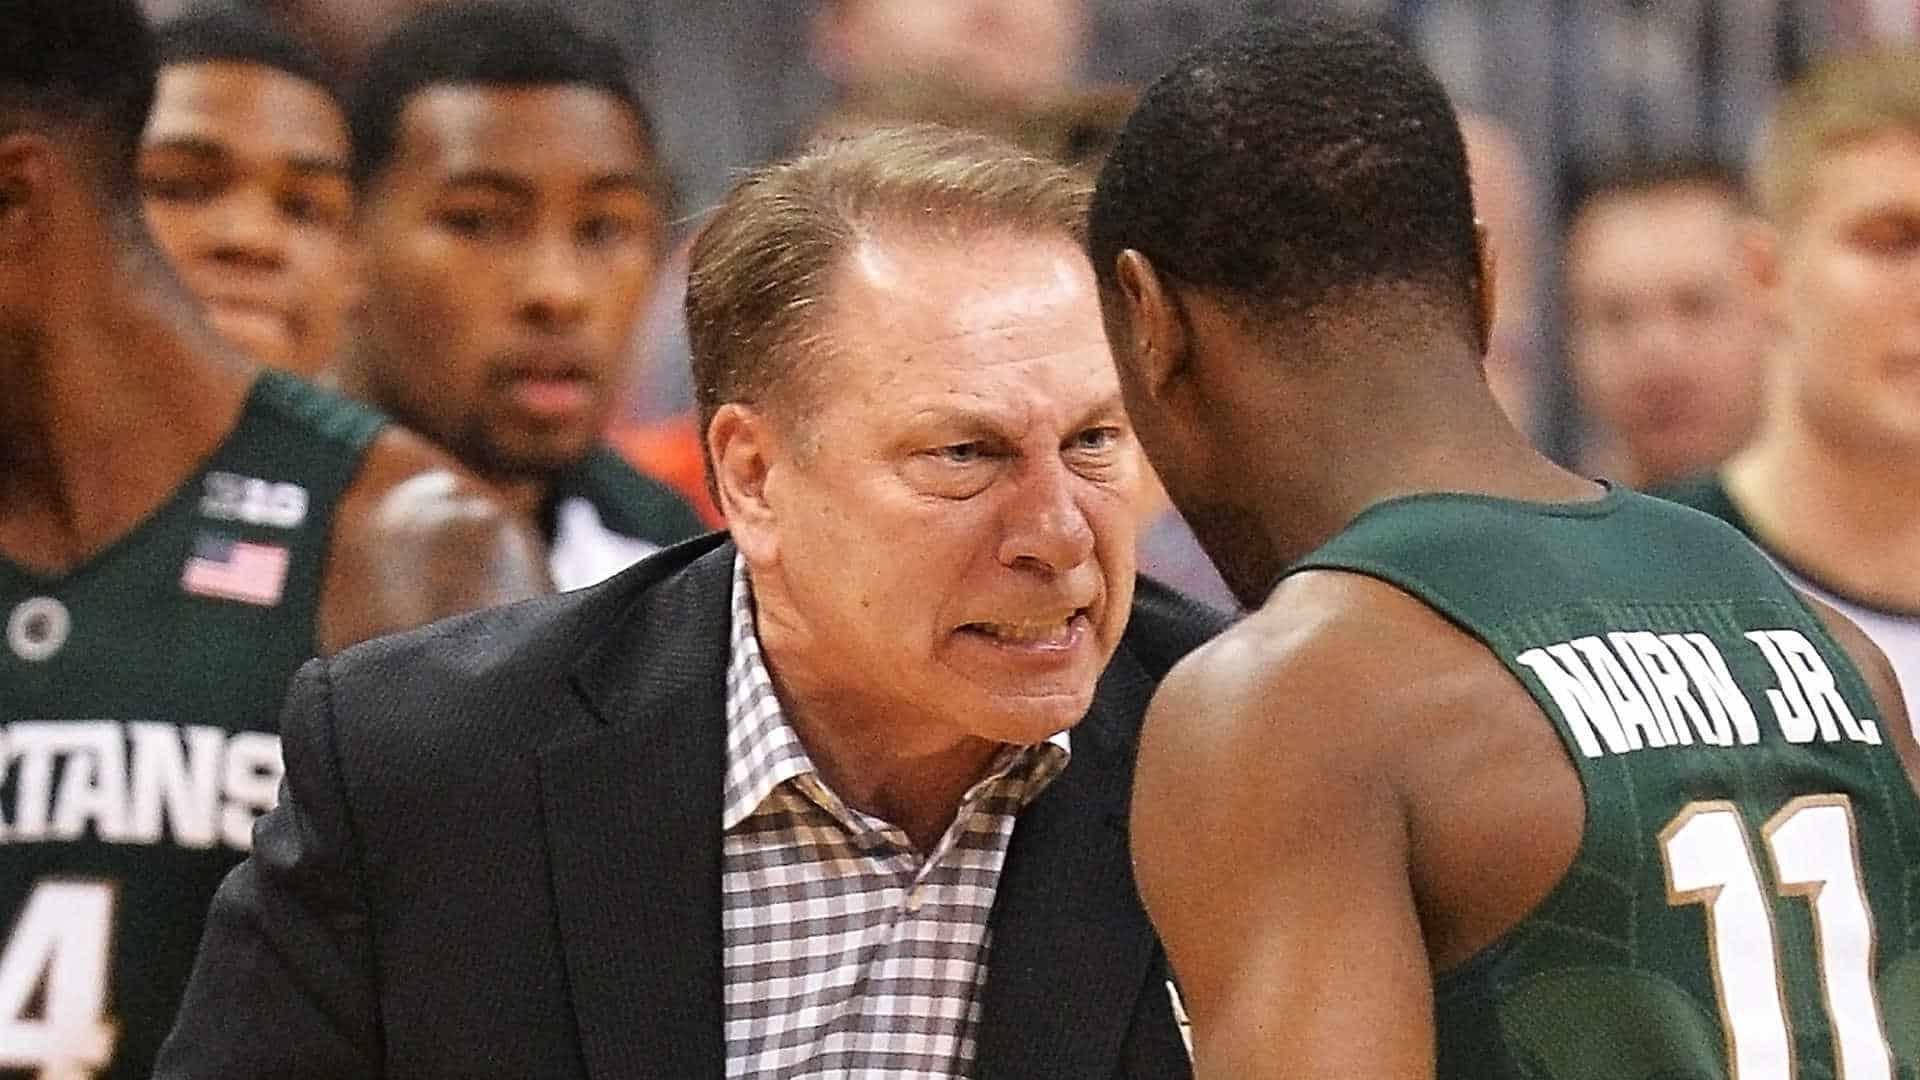 Tom Izzo - coach Michigan State